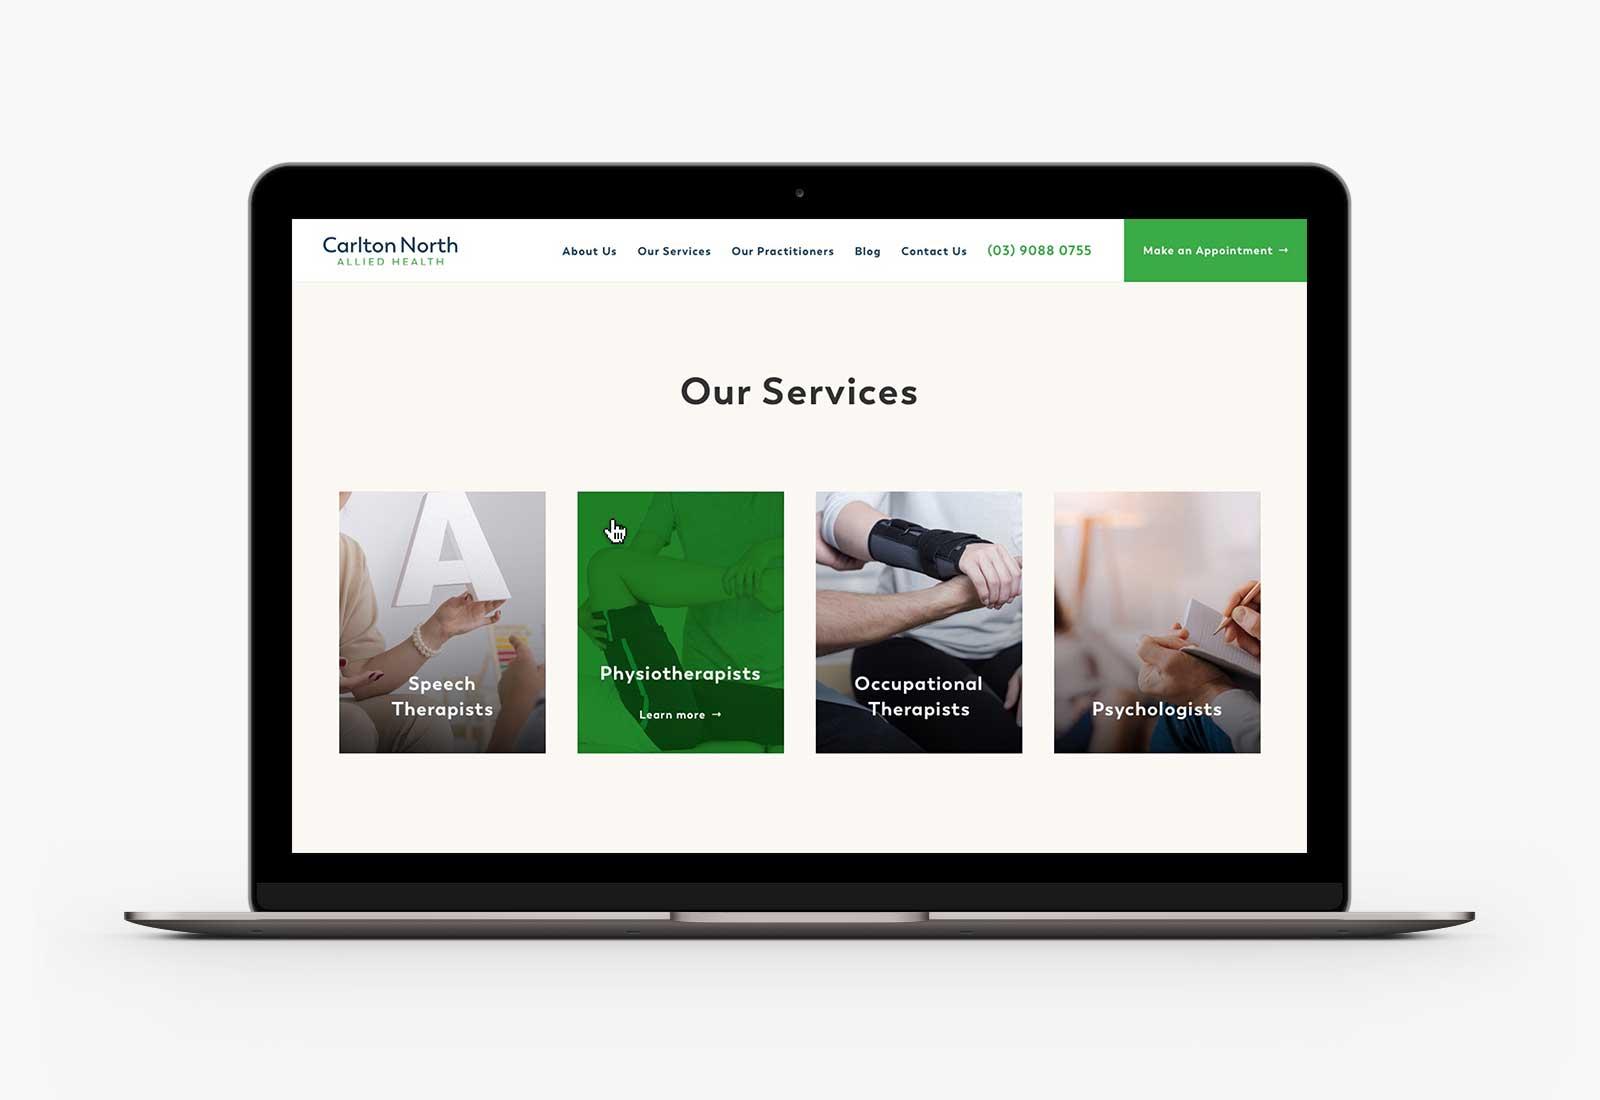 Carlton North Allied Health (CNAH) homepage desktop design on Macbook